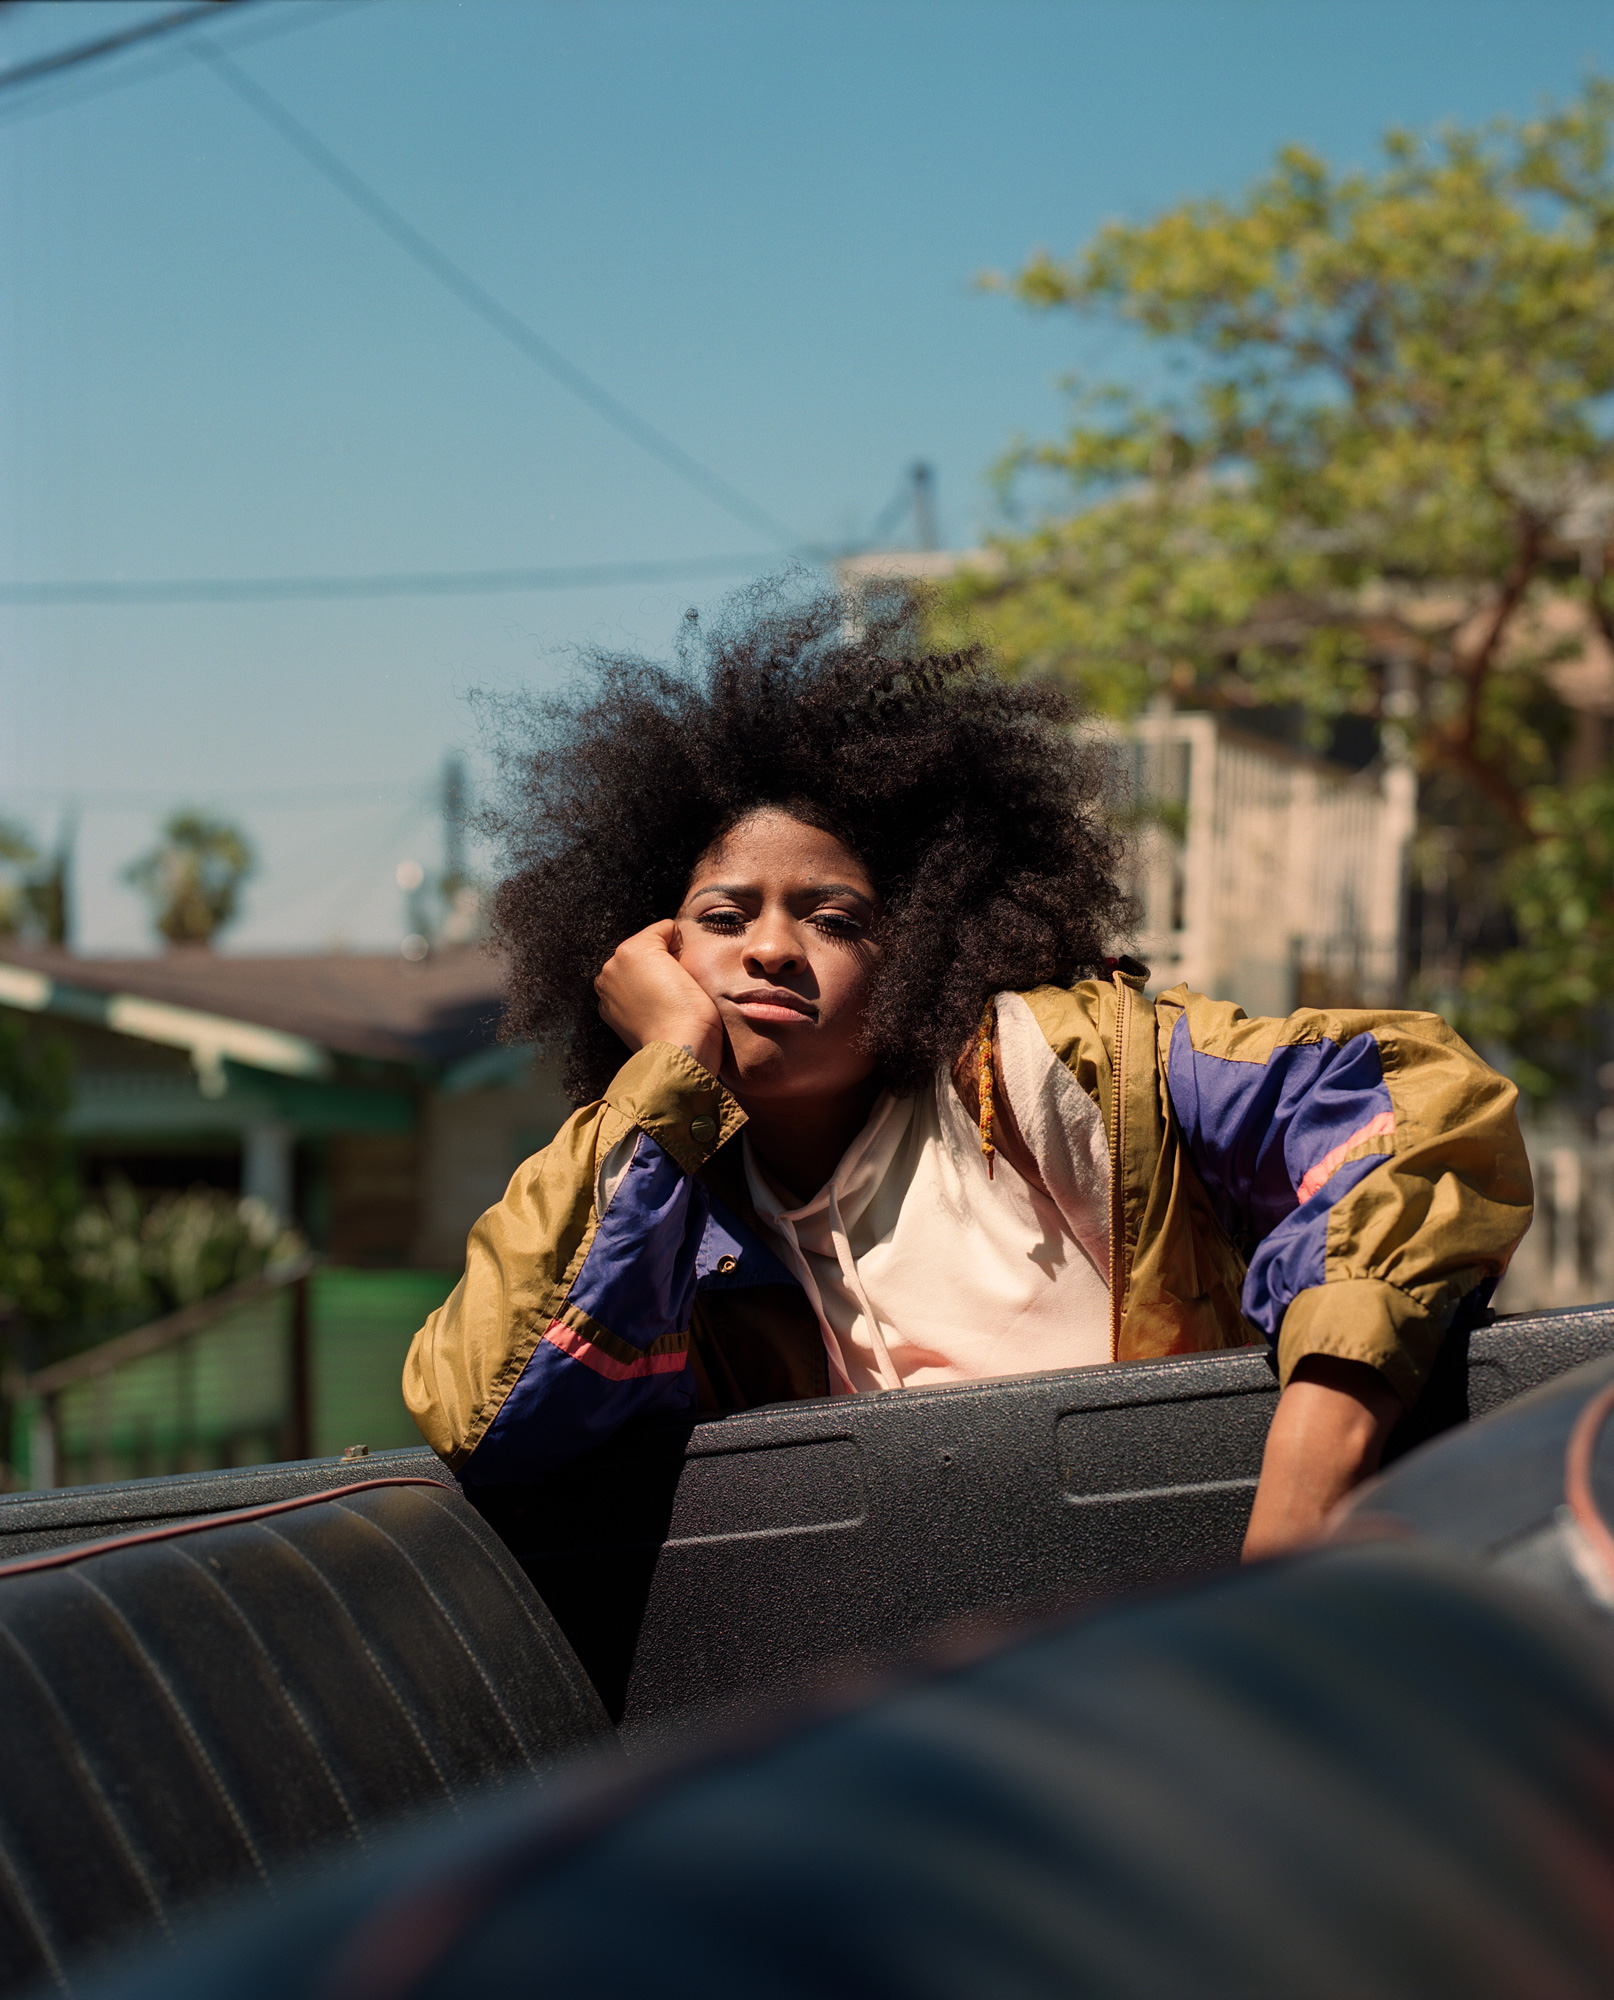 Rebel Rae, Singer portrait from a truck in Los Angeles, 2017 by ioannis Koussertari.